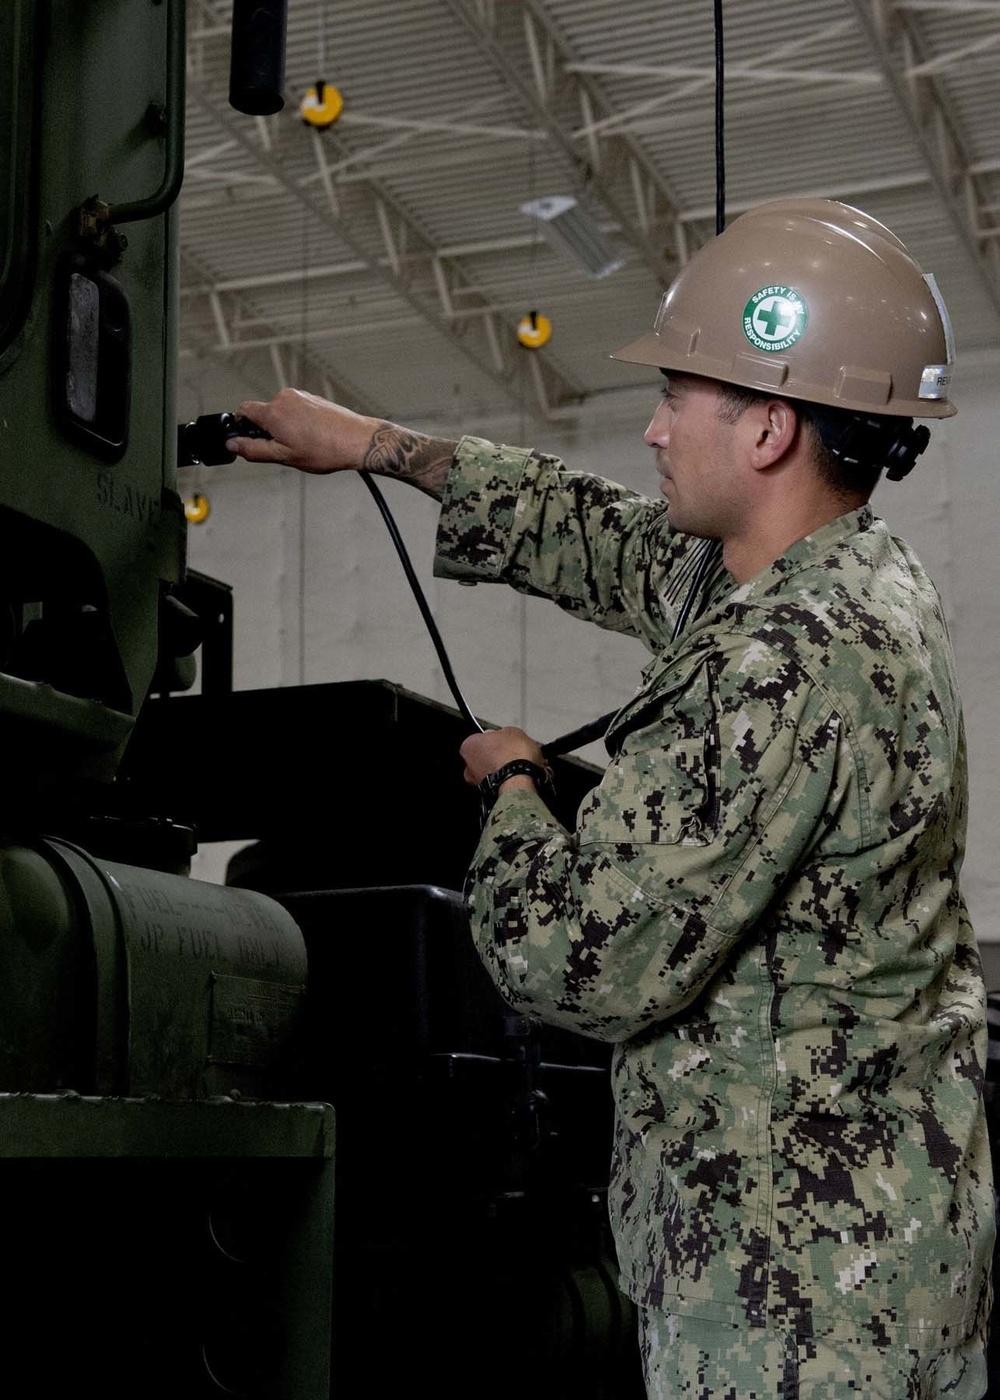 NCG-1 Launches New Battery Charging Pilot Program